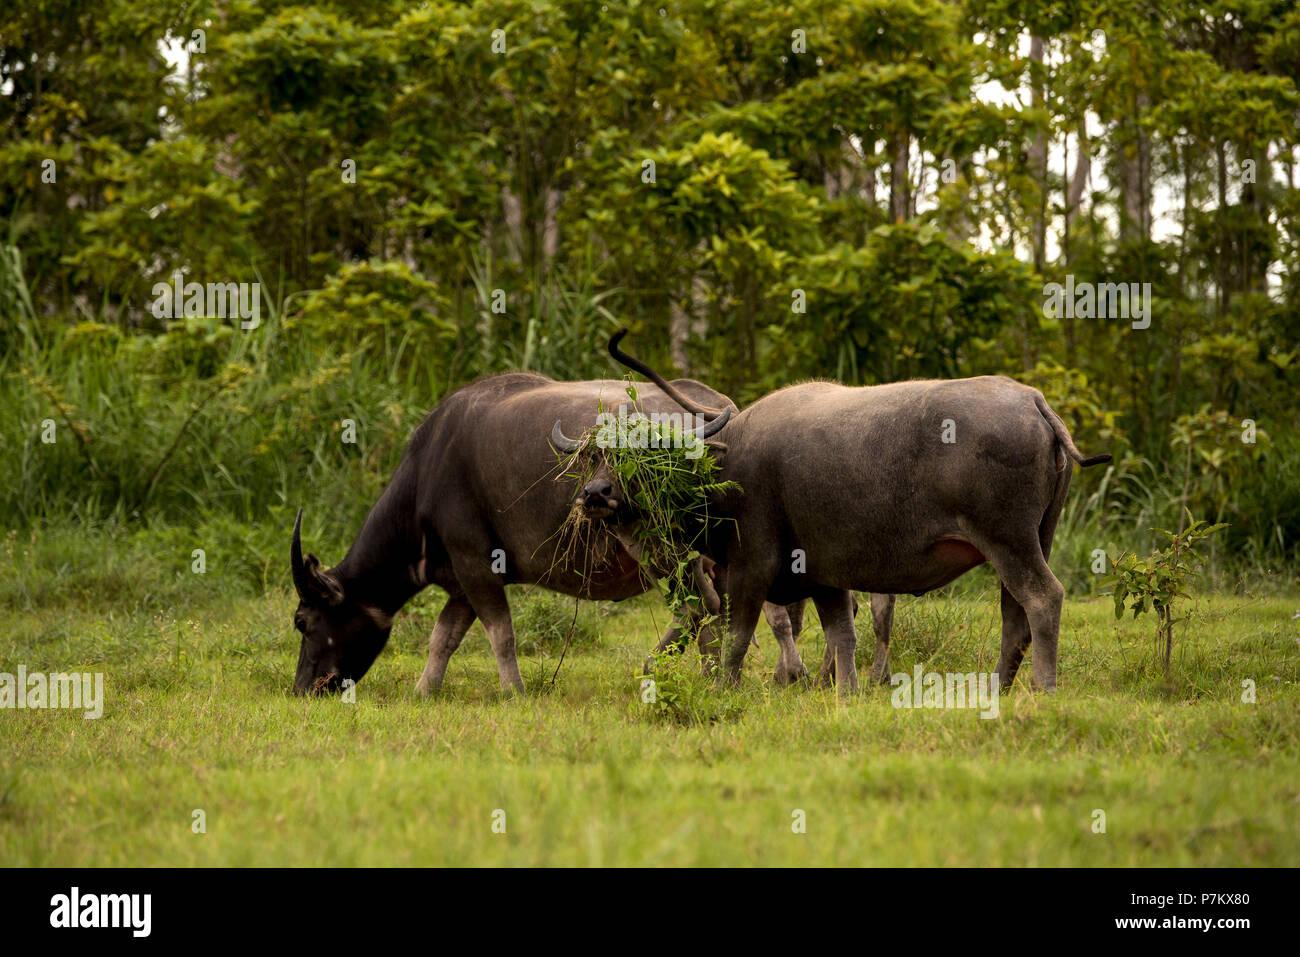 Semi-wild water buffalos - Stock Image